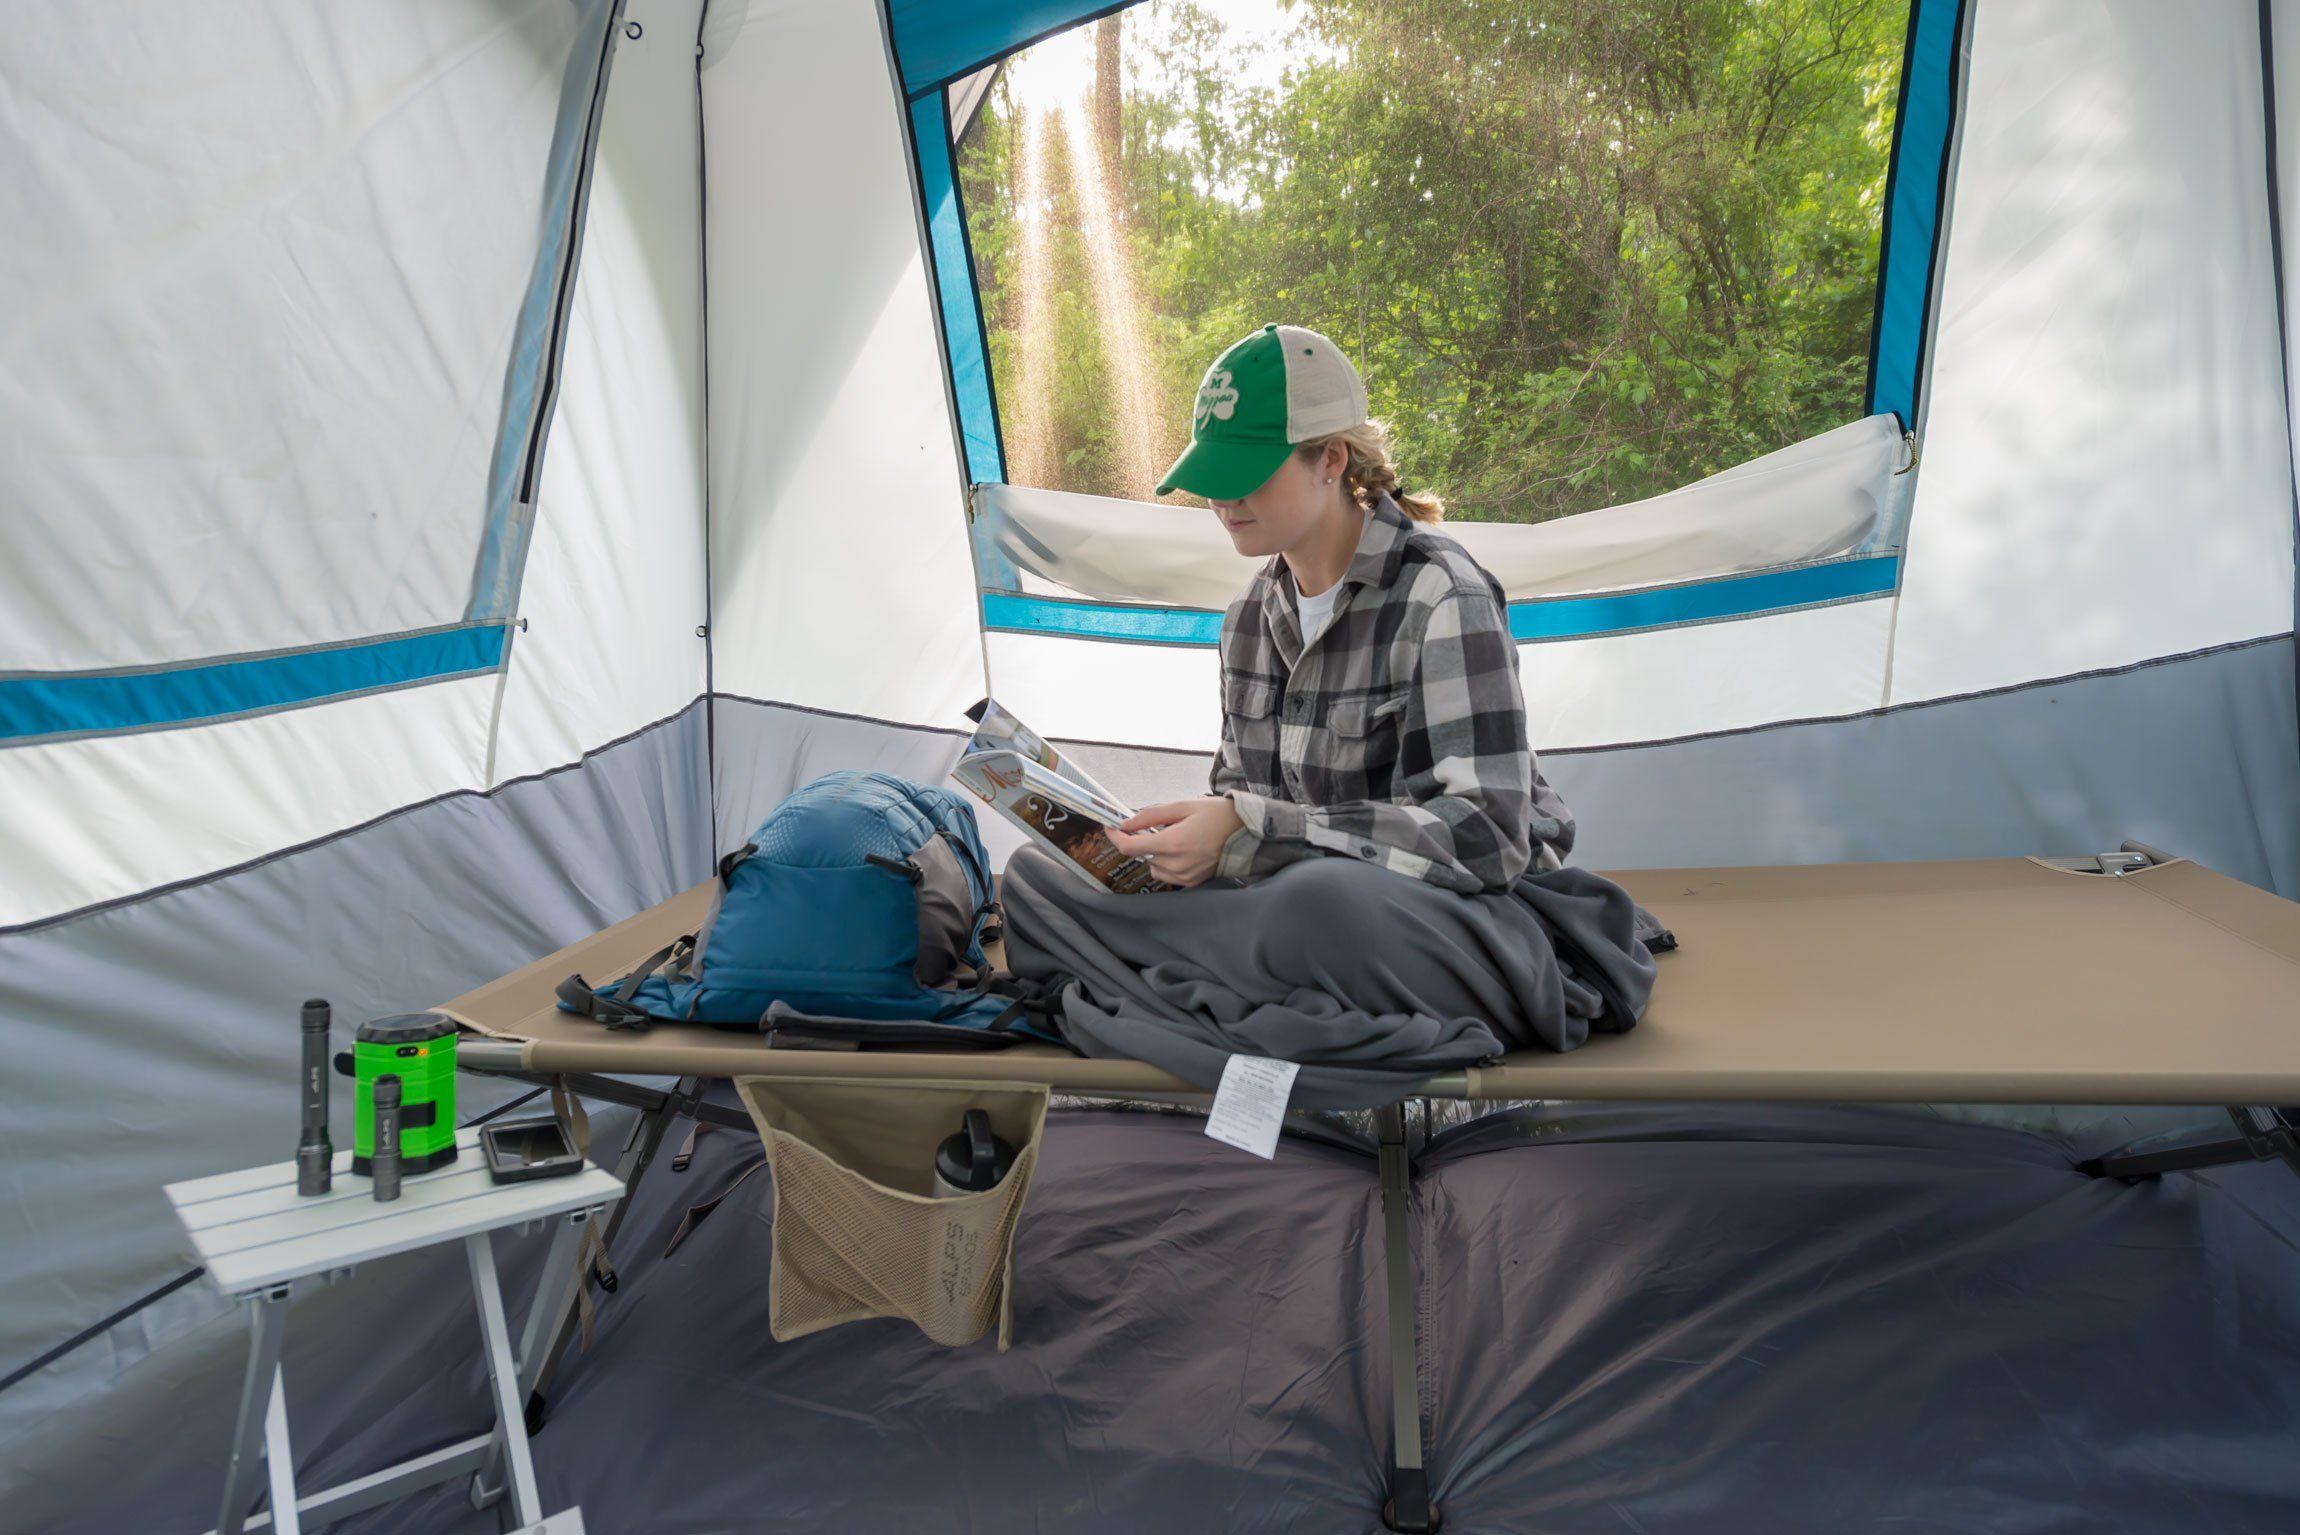 alps mountaineering sidekick camp stool